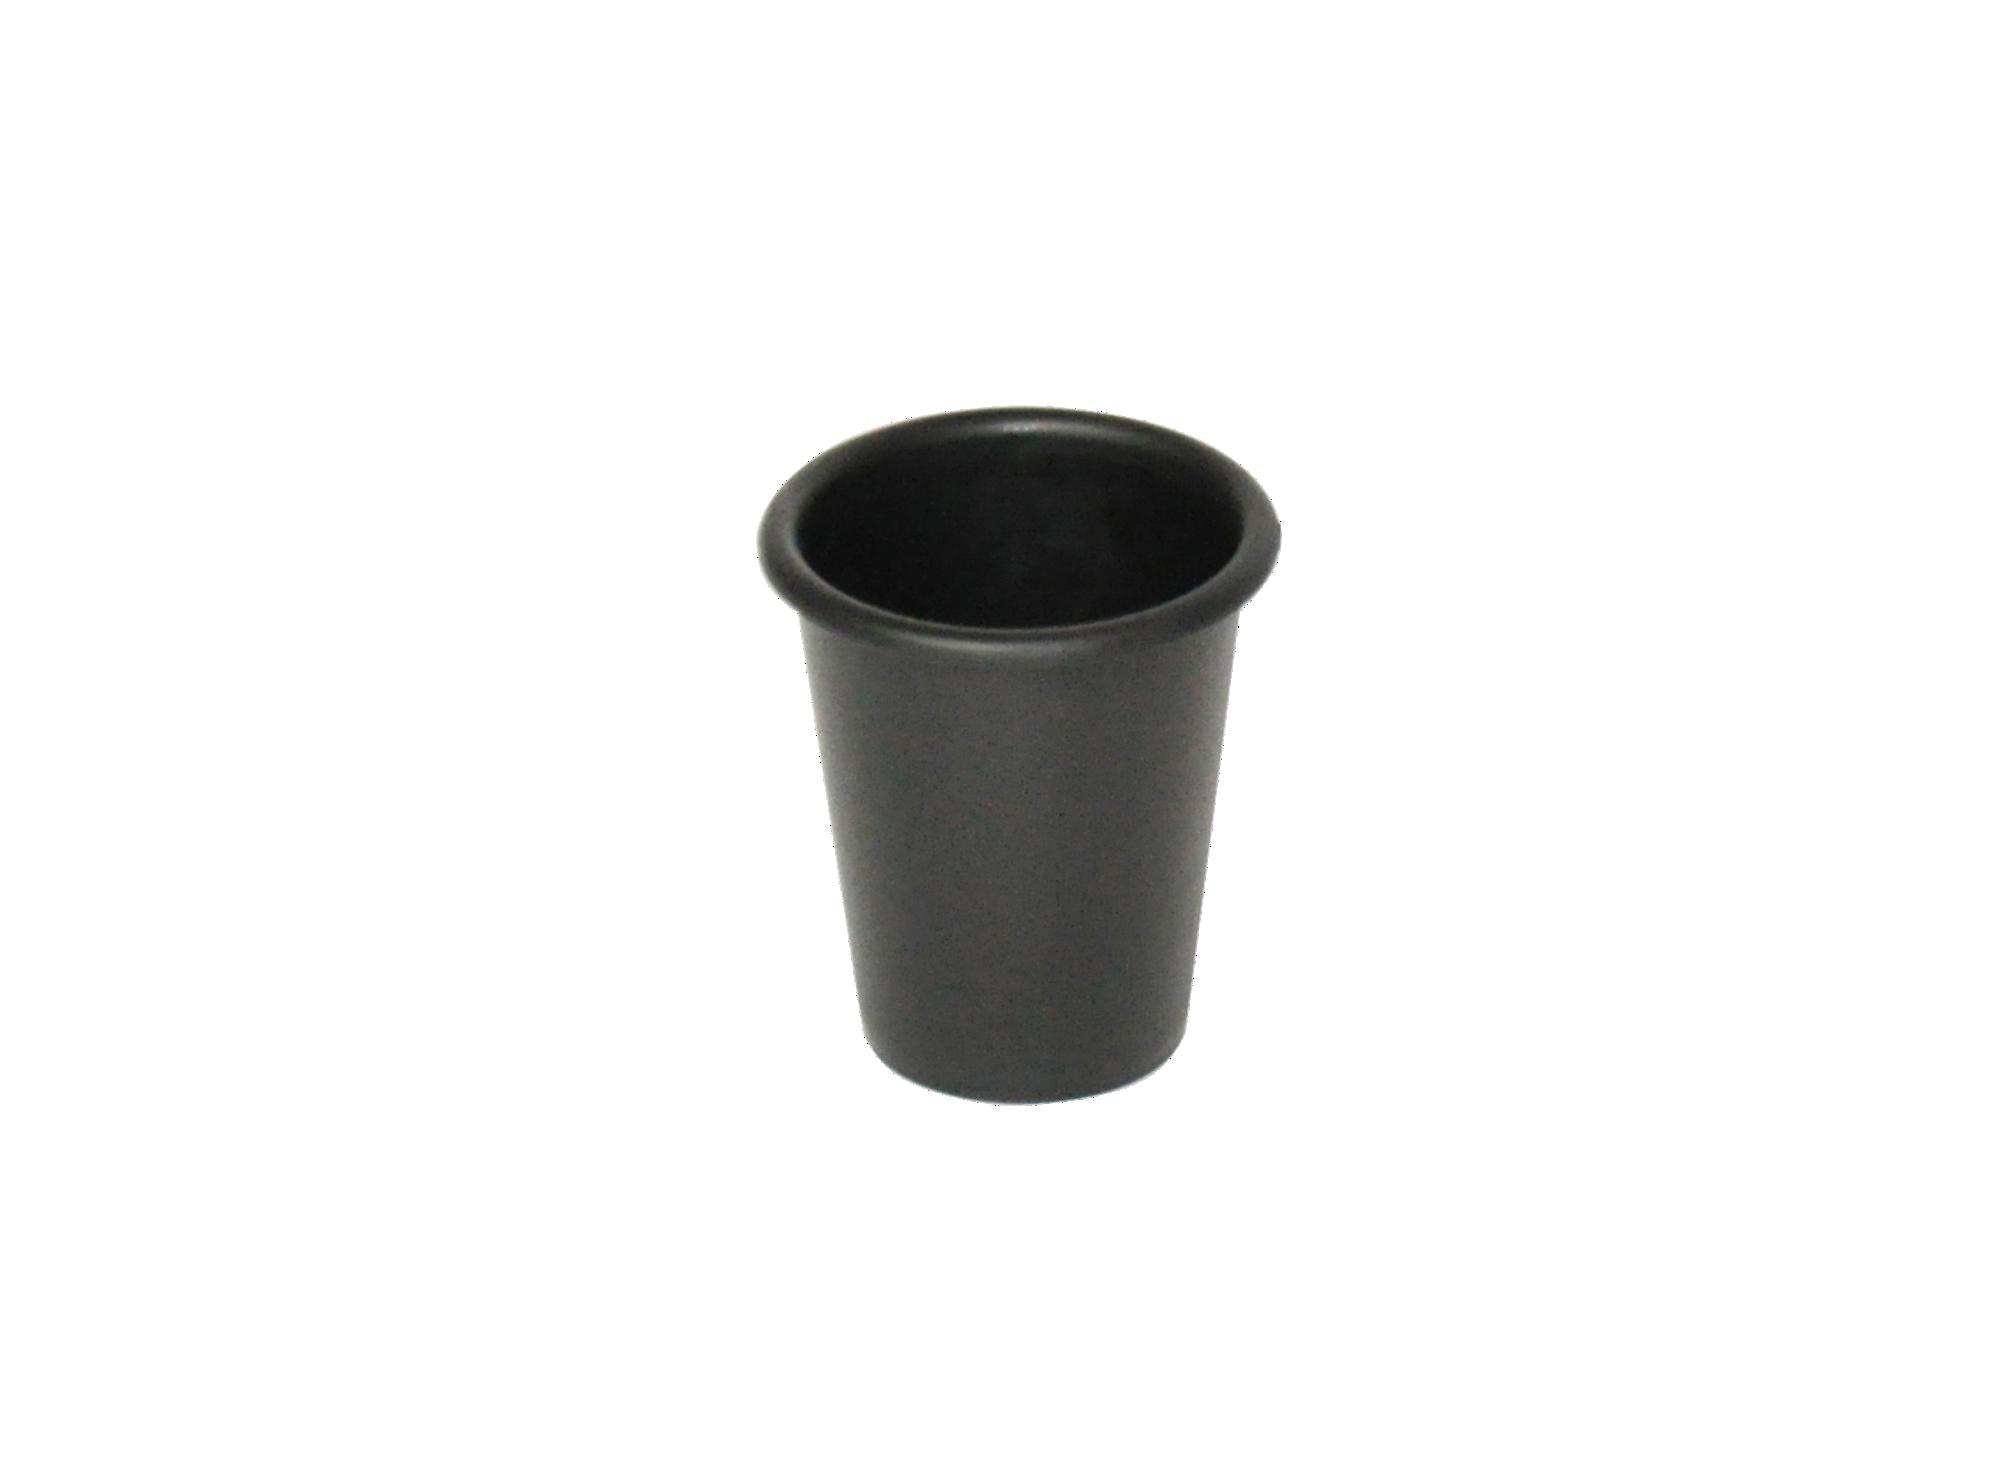 Gobelet en polypropylene noir et bois hevea